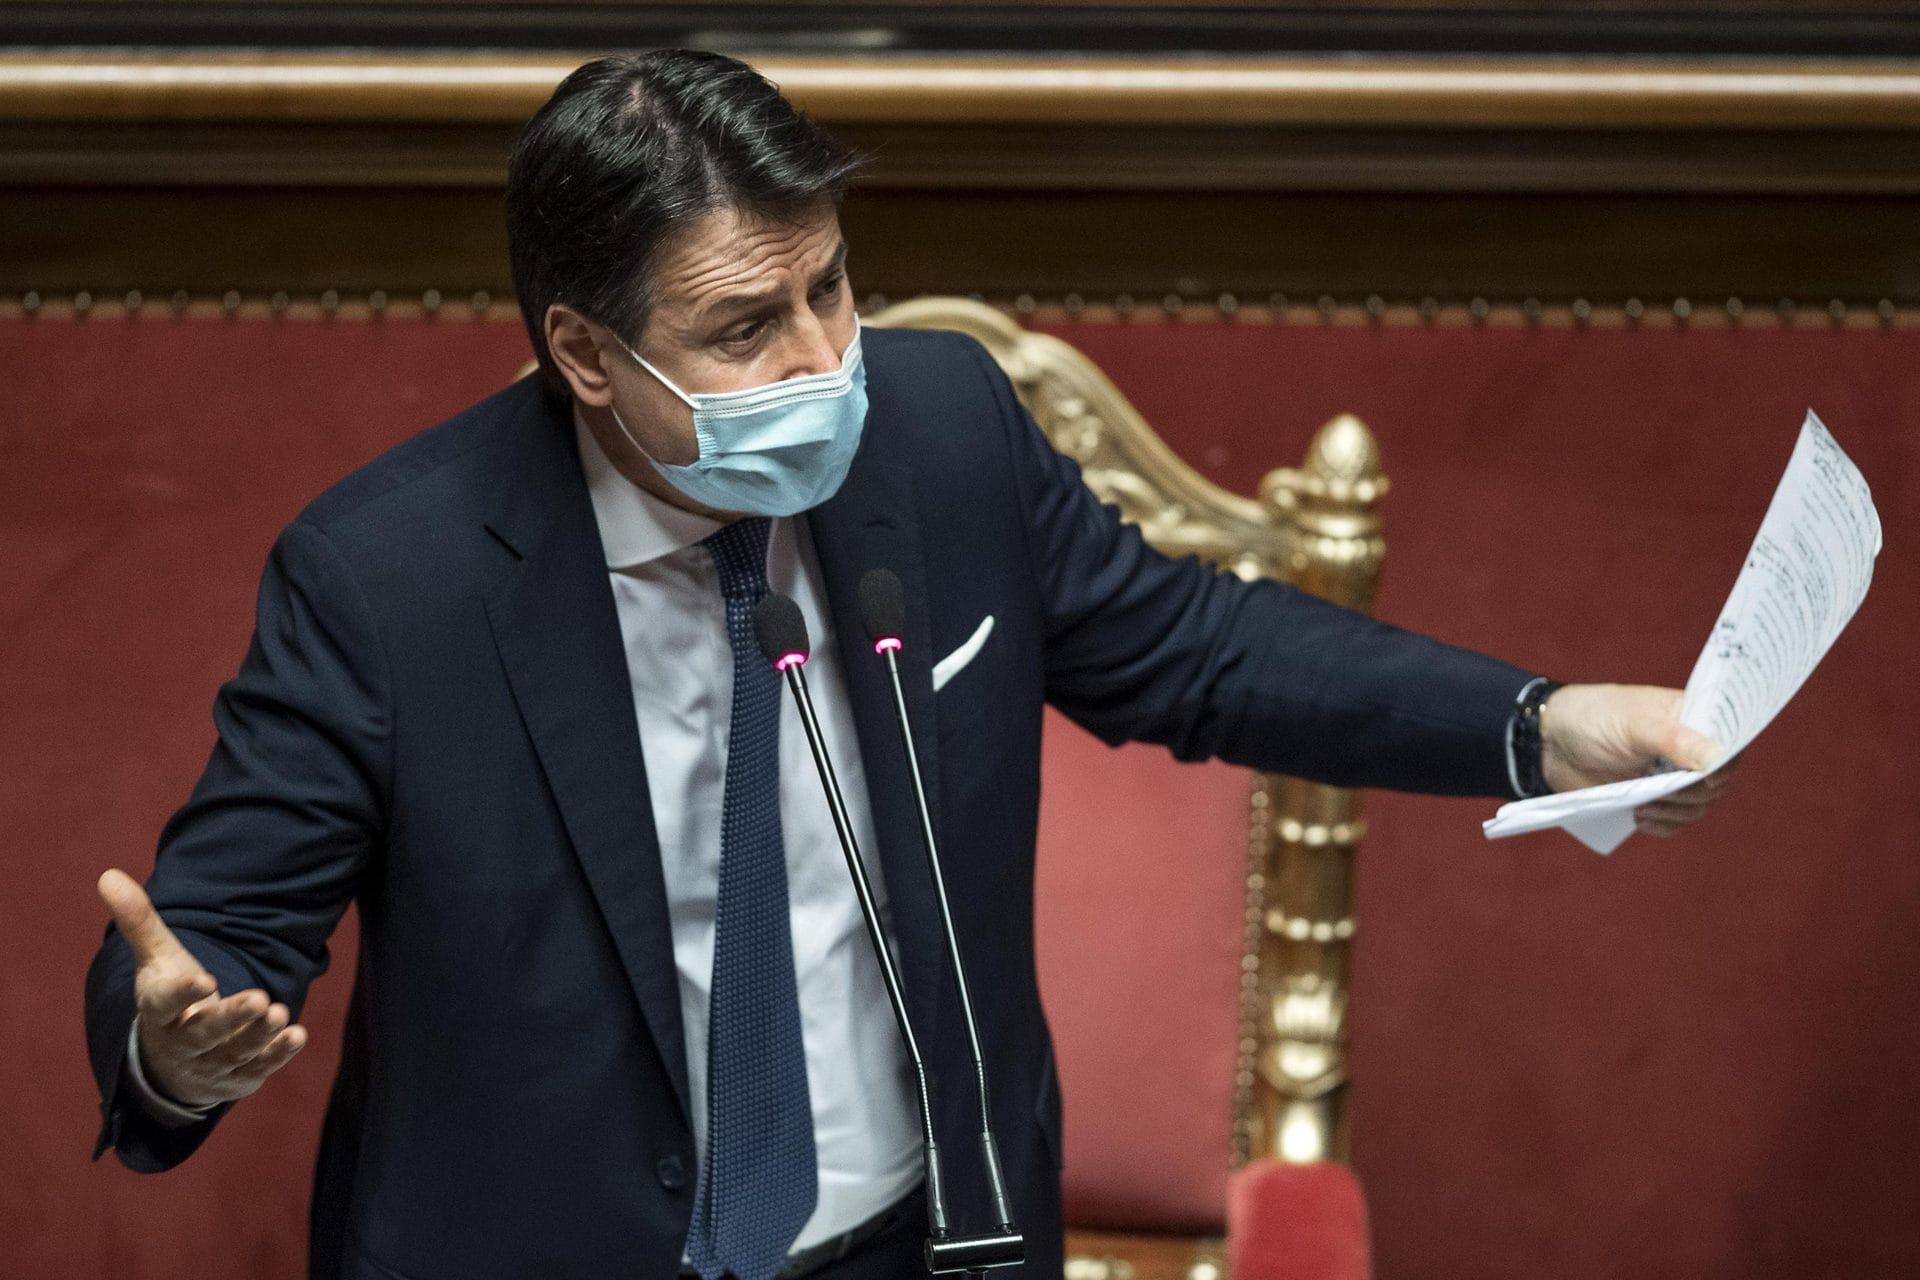 Italiens Ministerpräsident Conte reicht Rücktritt ein Erneuter Machtpoker